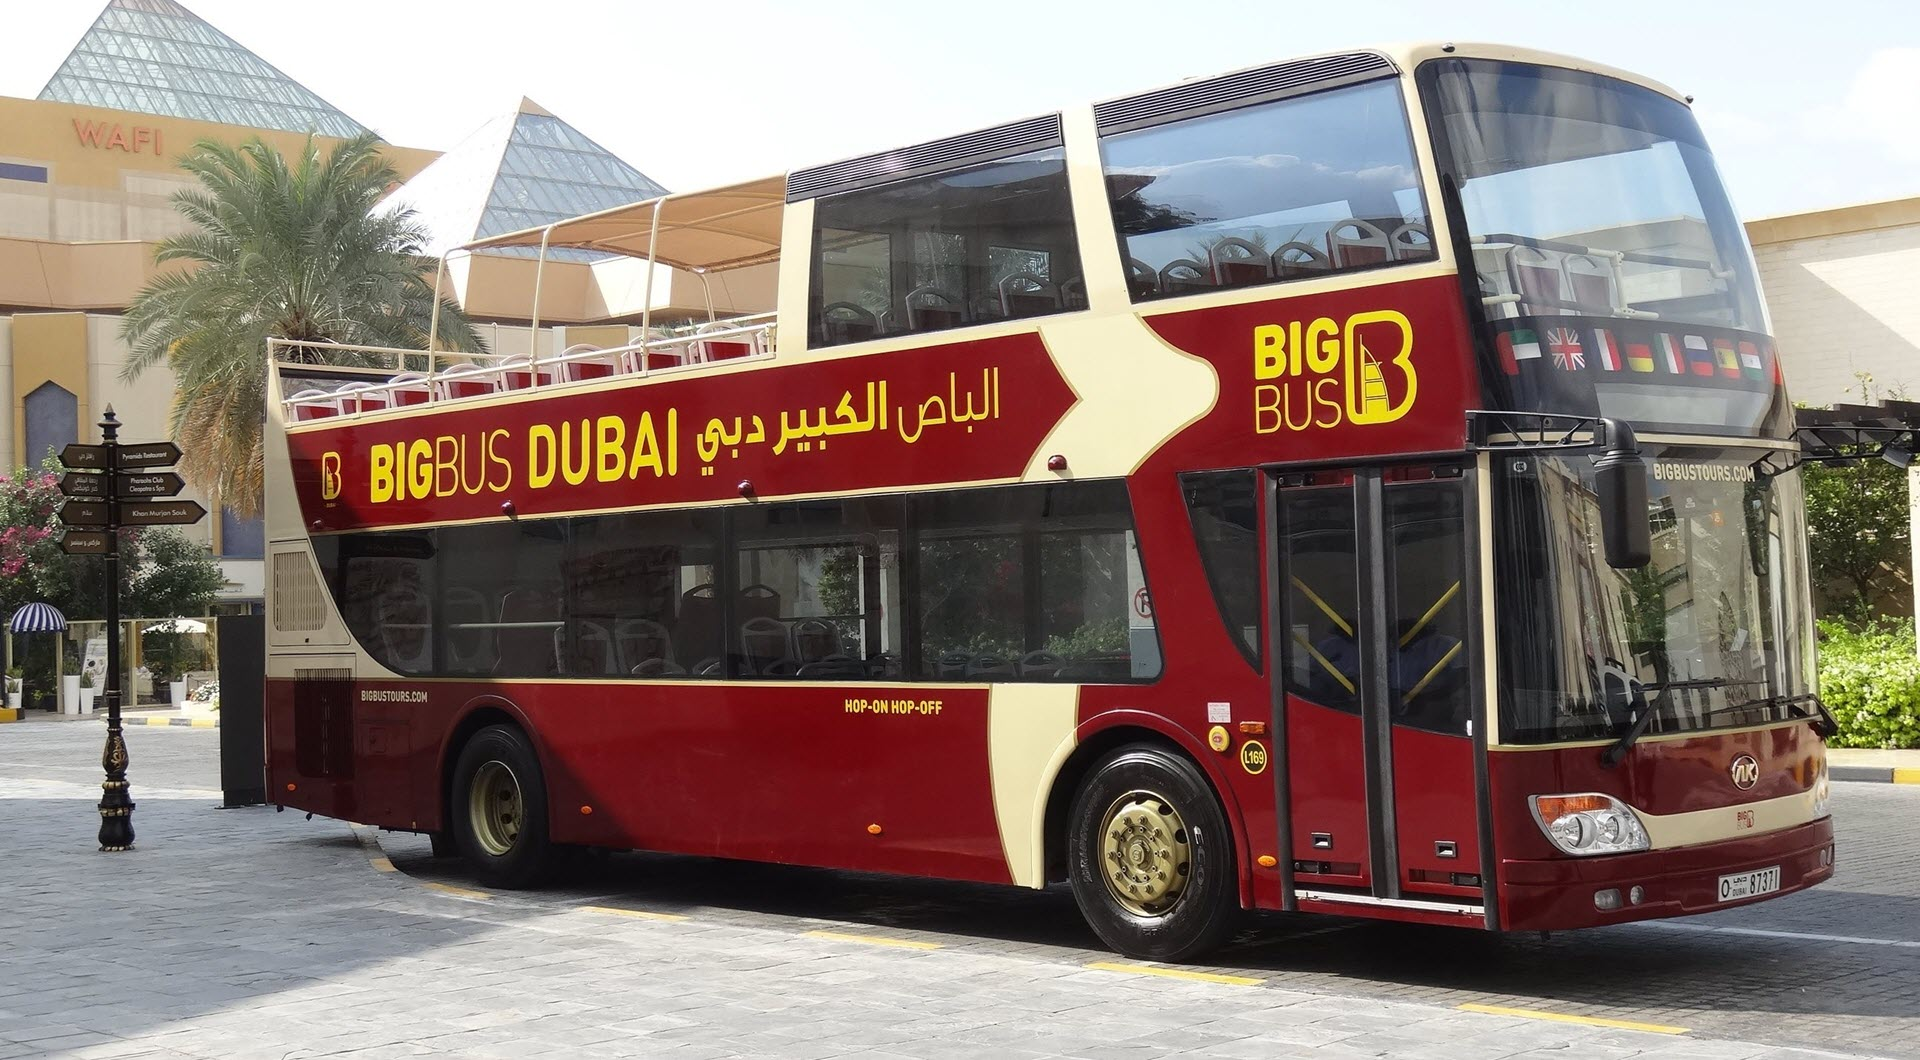 Dubai Big Bus Tour, Cheapest Dubai Transportation